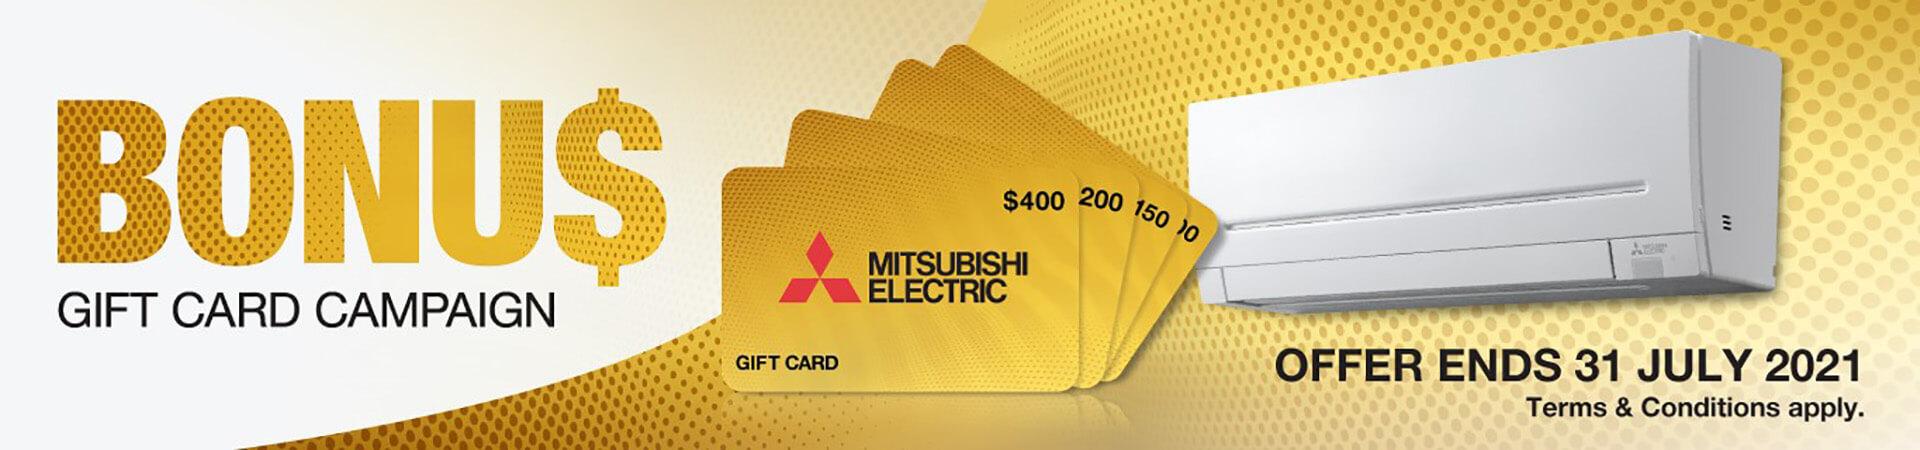 Mitsubishi Electric Bonsu Gift Card Campaign 2021